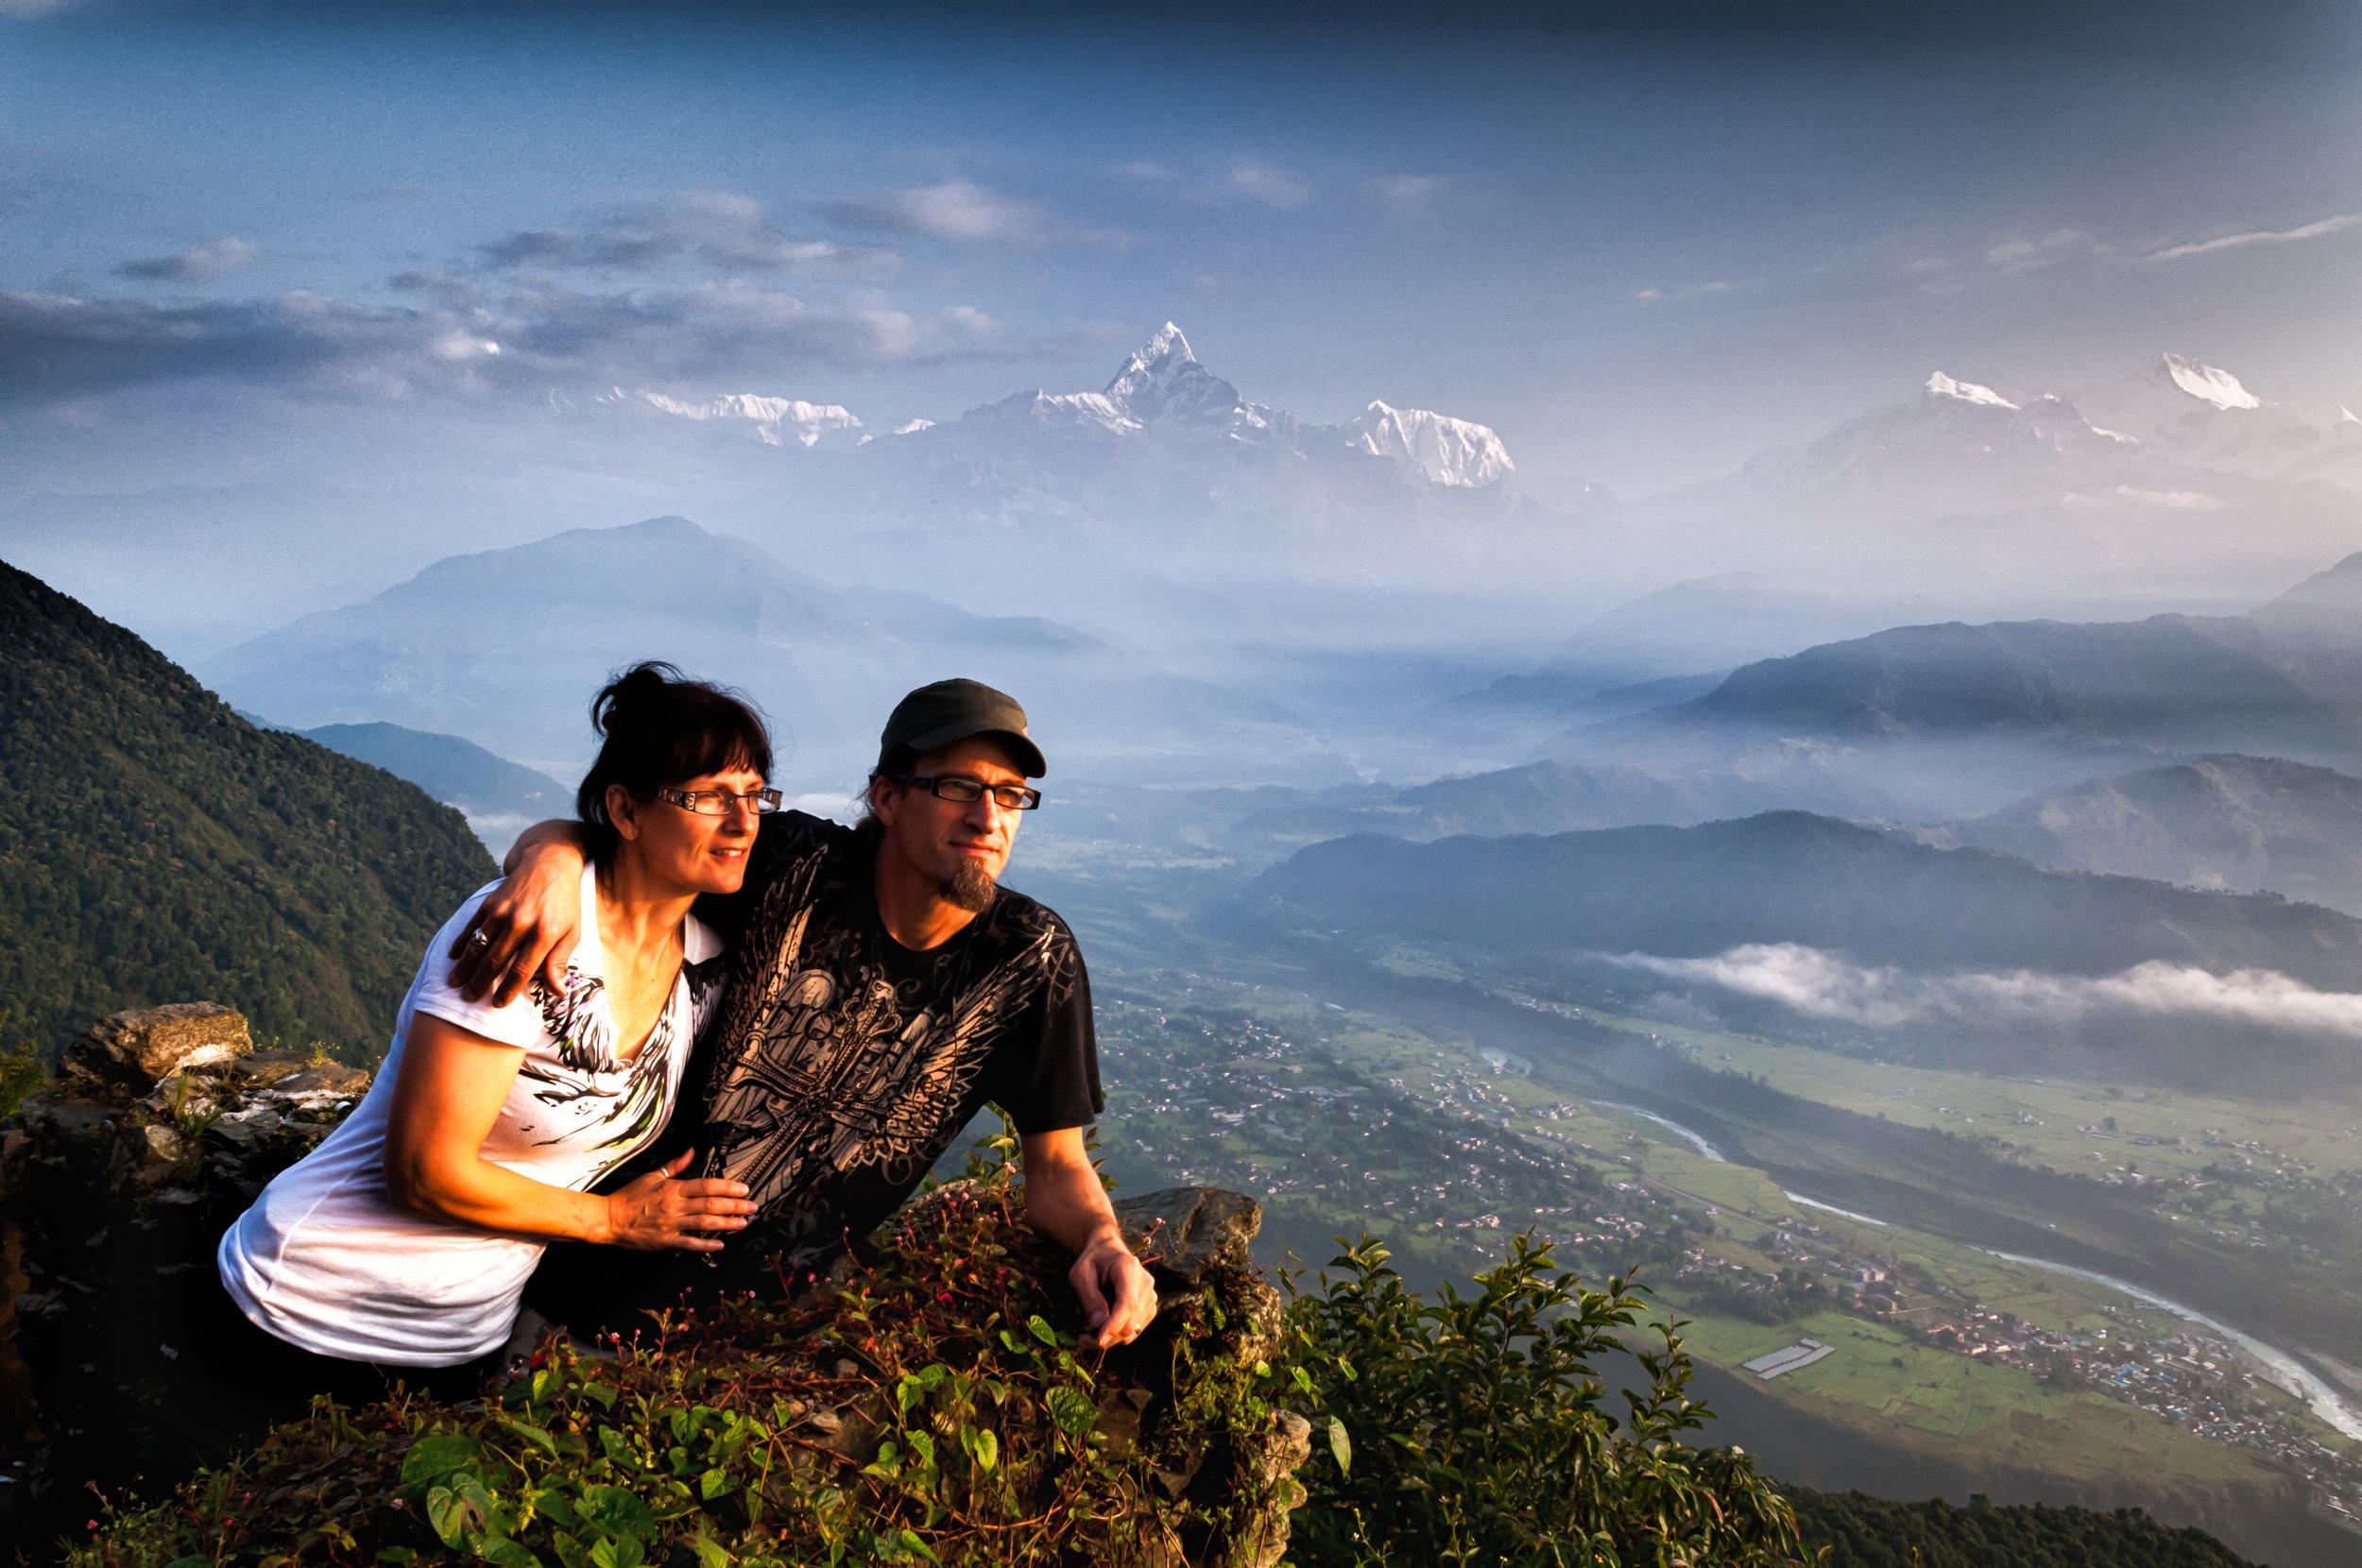 20121001-Asia-2012-travel-043931-Edit.jpg